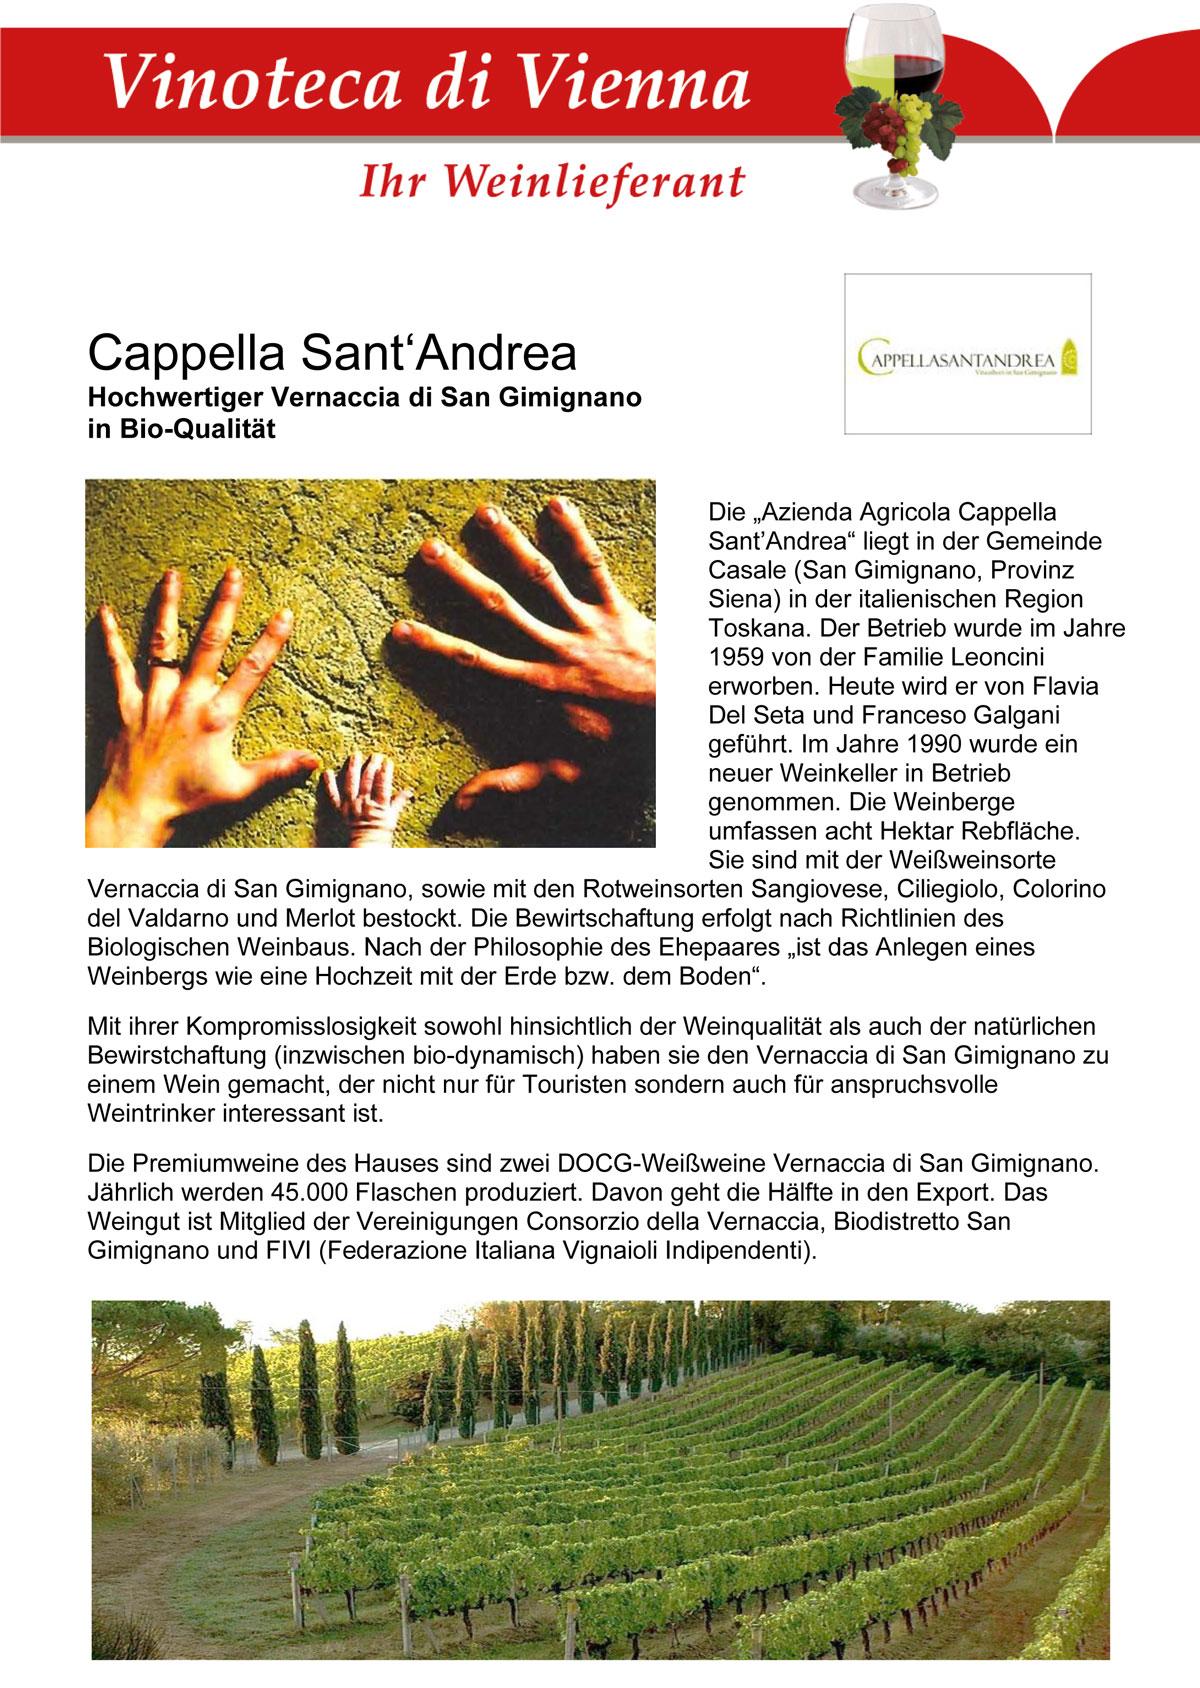 Cappella Sant'Andrea, Hochwertiger Vernaccia di San Gimignano in Bio-Qualität